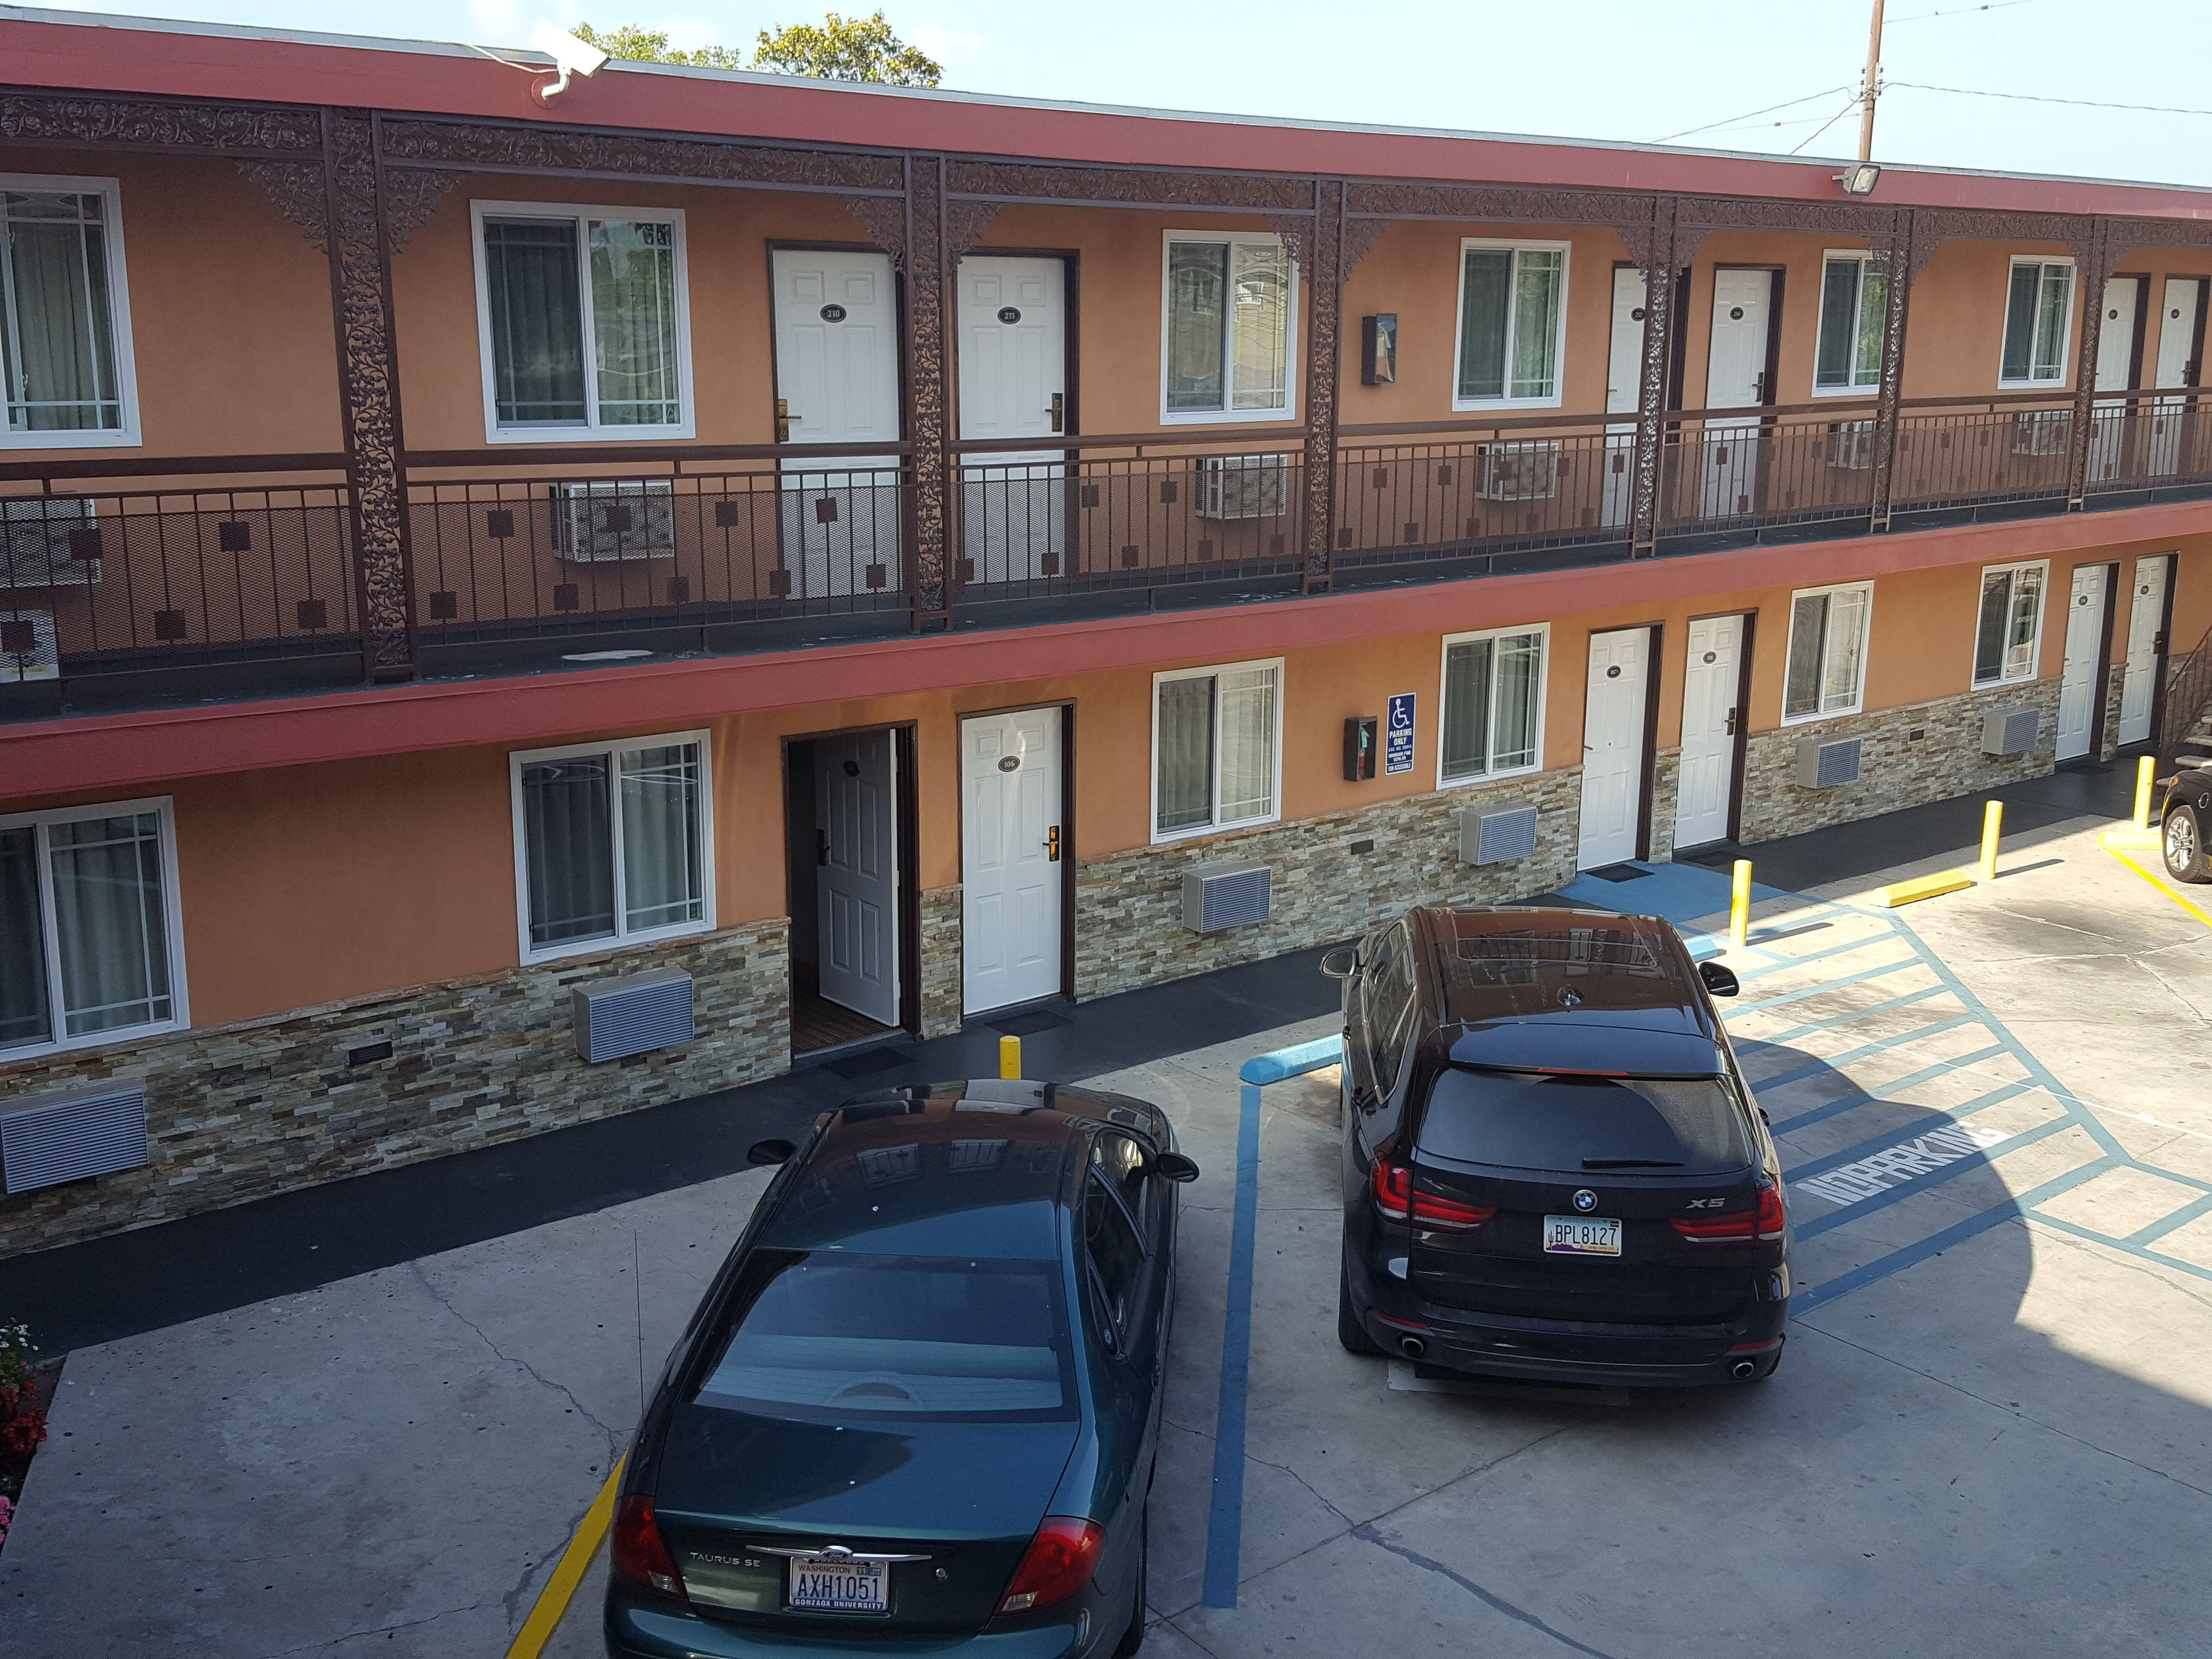 Travel Inn Motel (south Vermont Avenue)